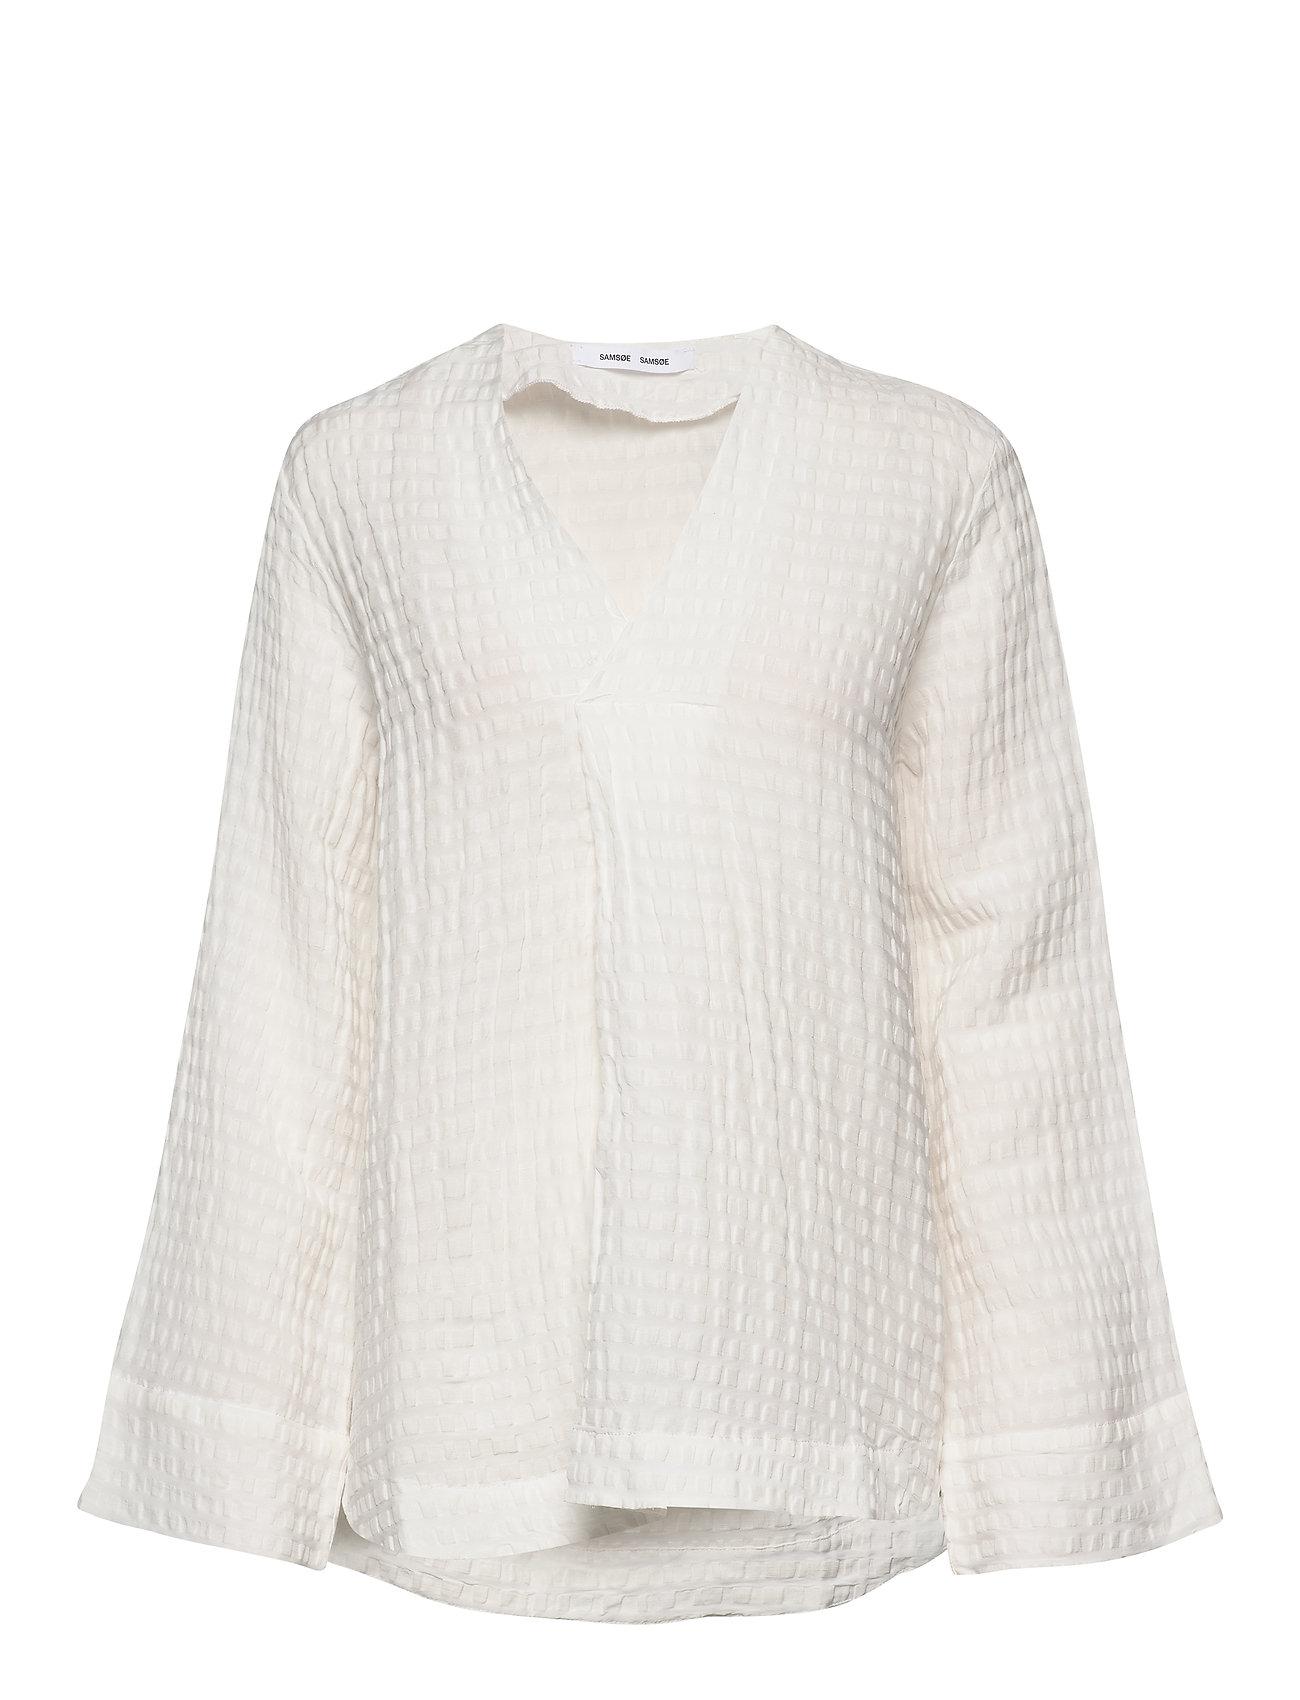 Samsøe Samsøe Juta blouse 11456 - WARM WHITE